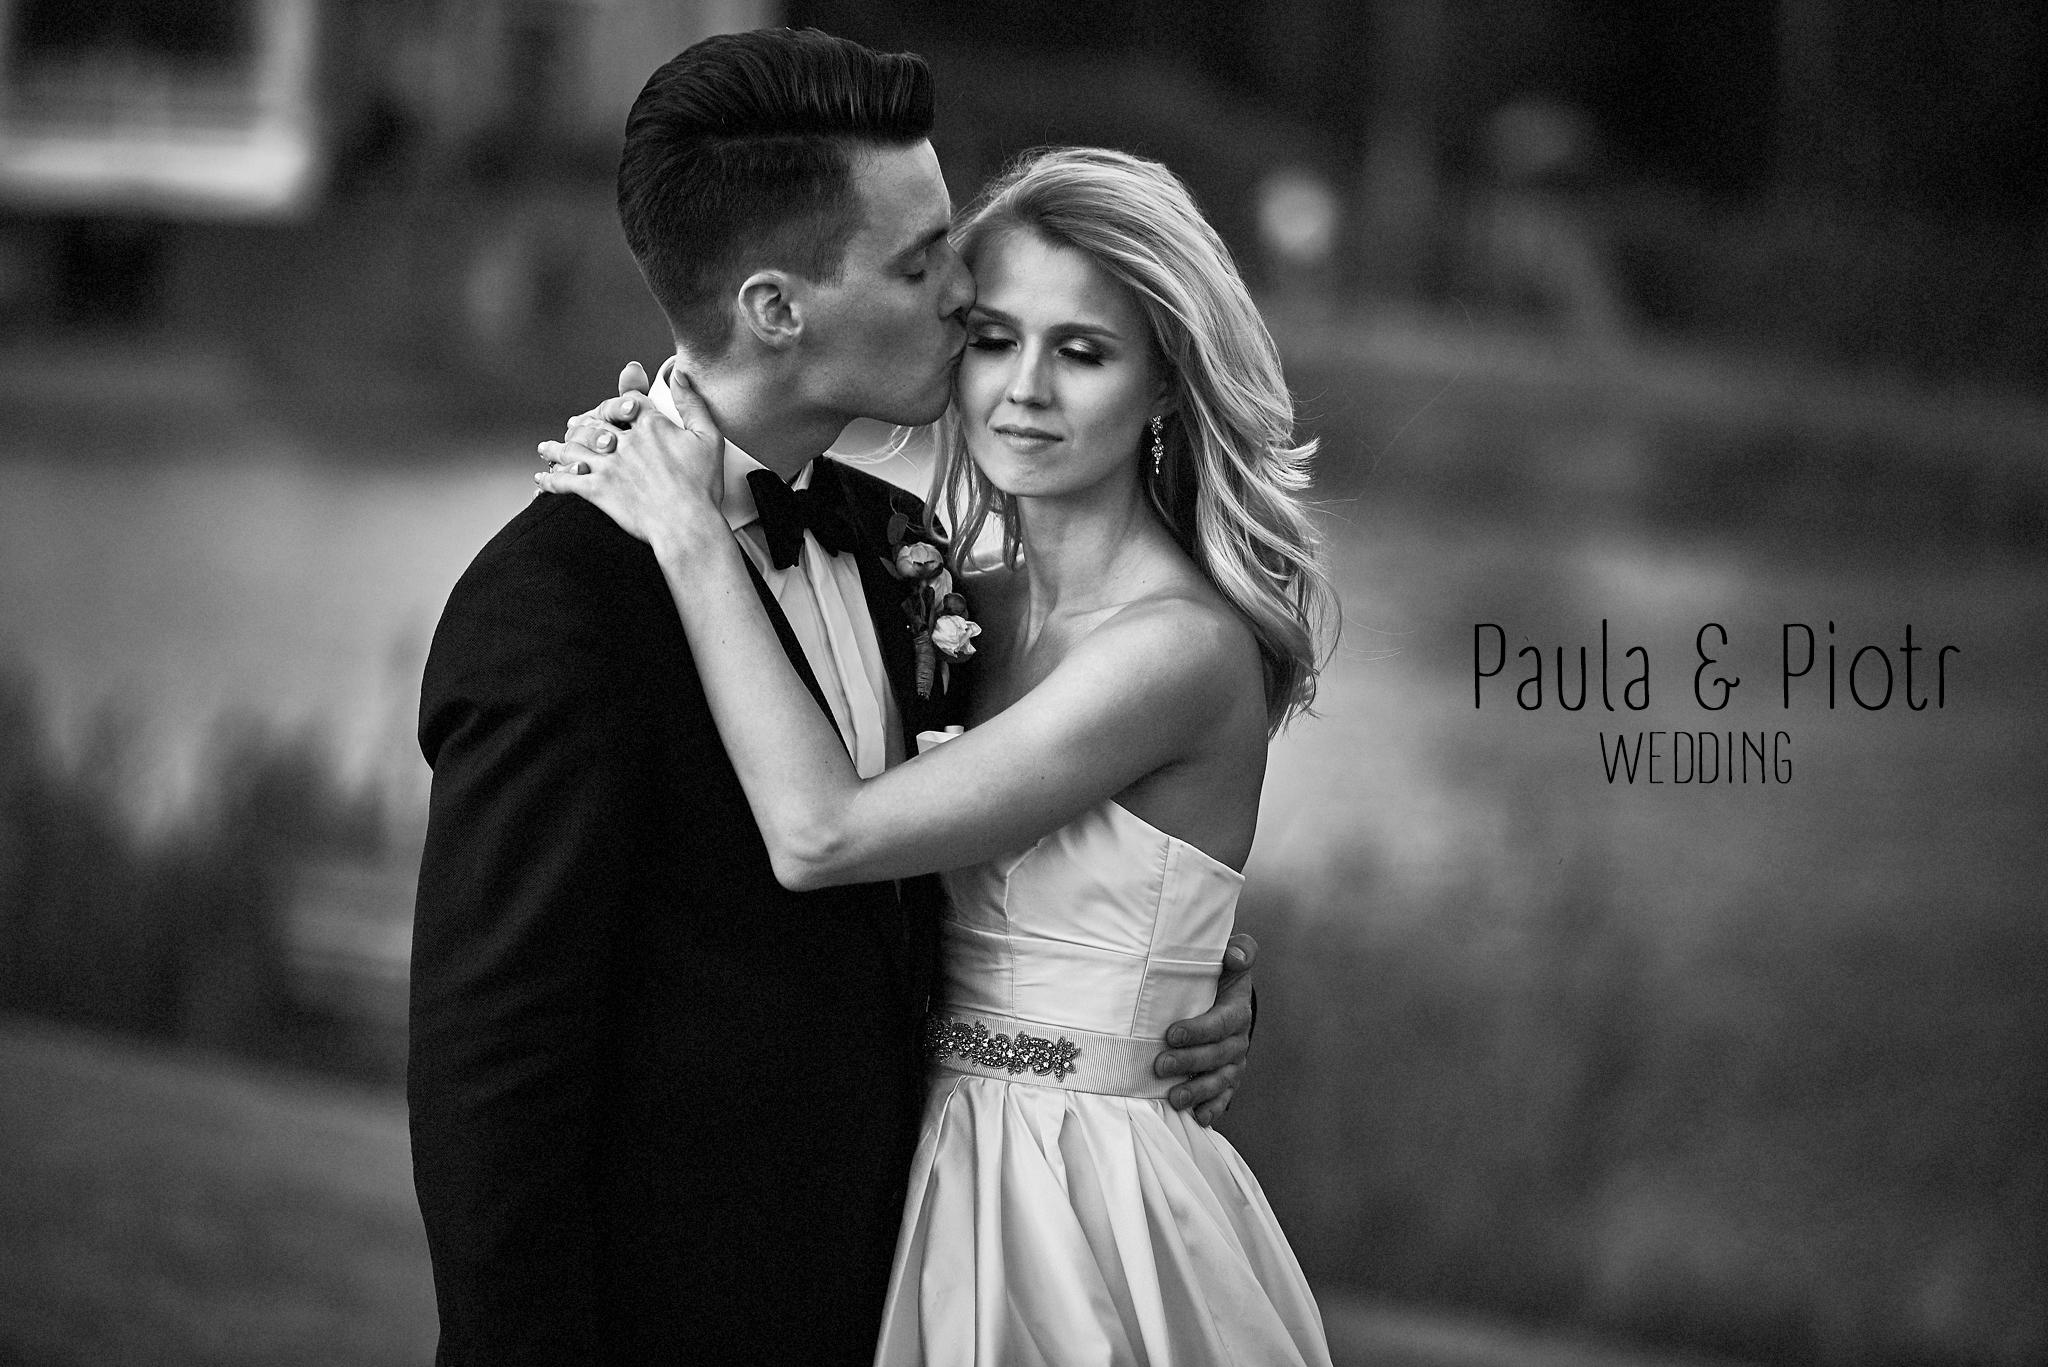 Paula & Piotr